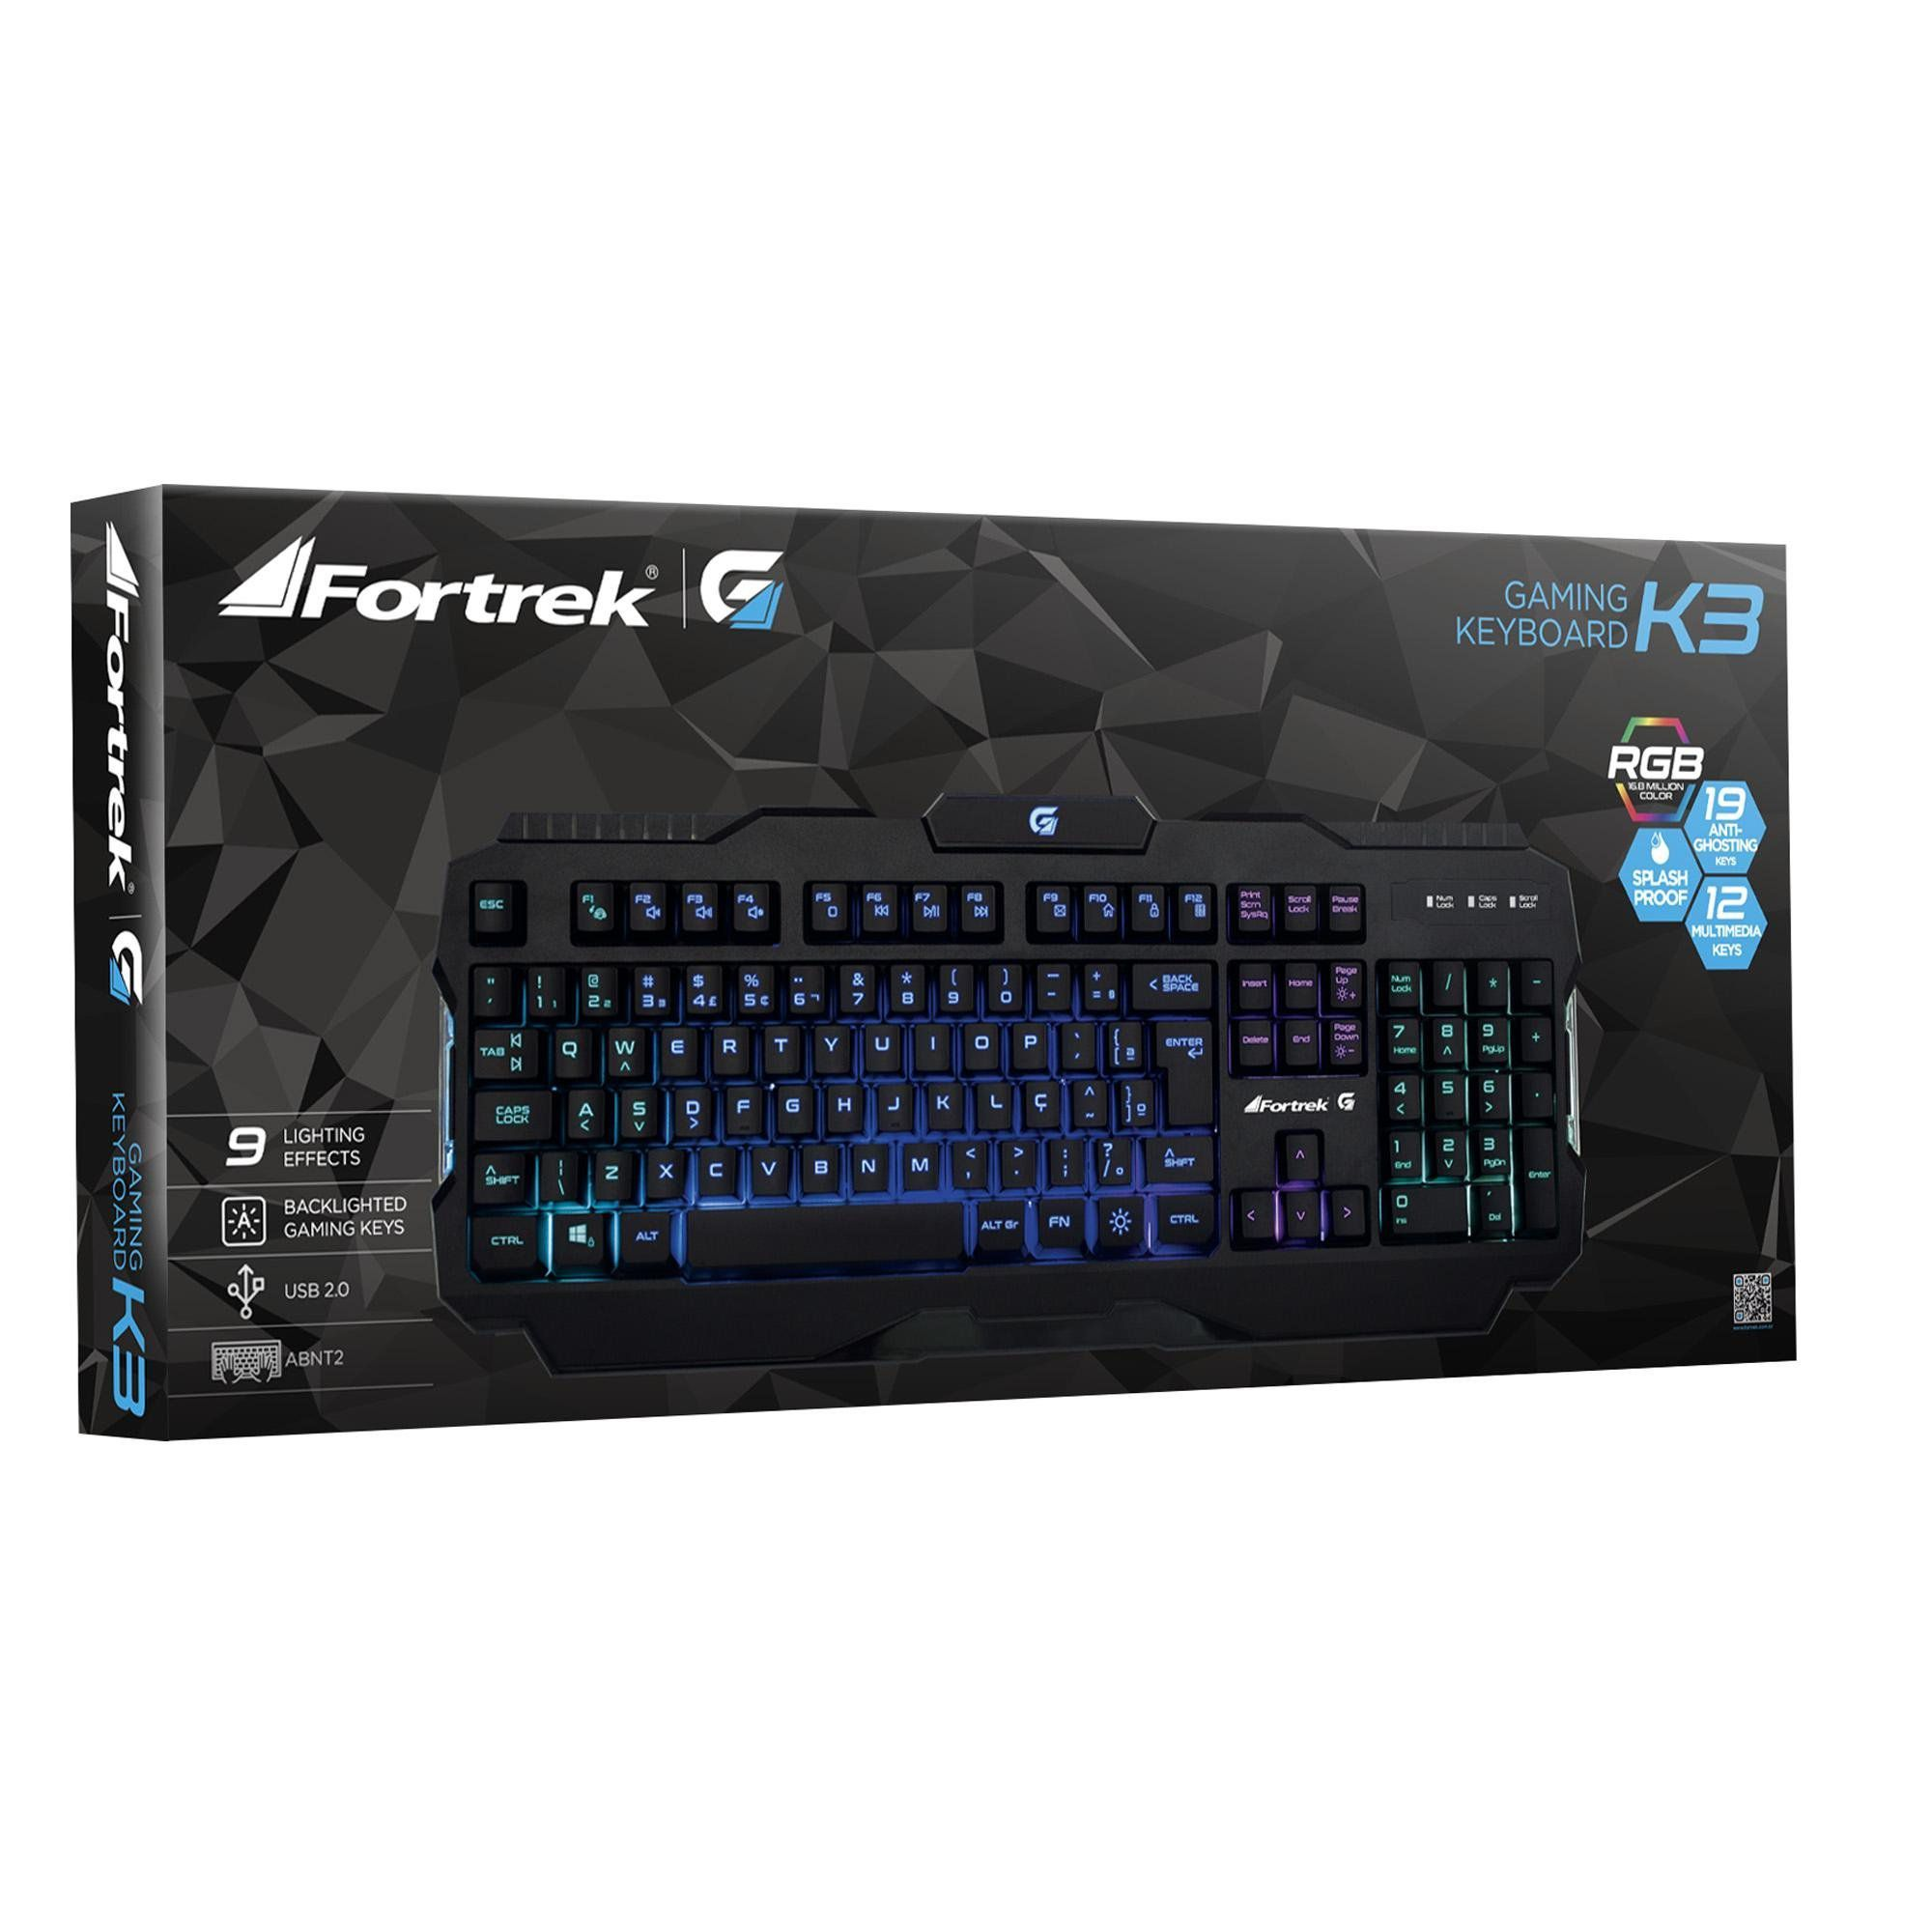 Teclado Gamer Pro K3 RGB Preto 64471 - Fortrek